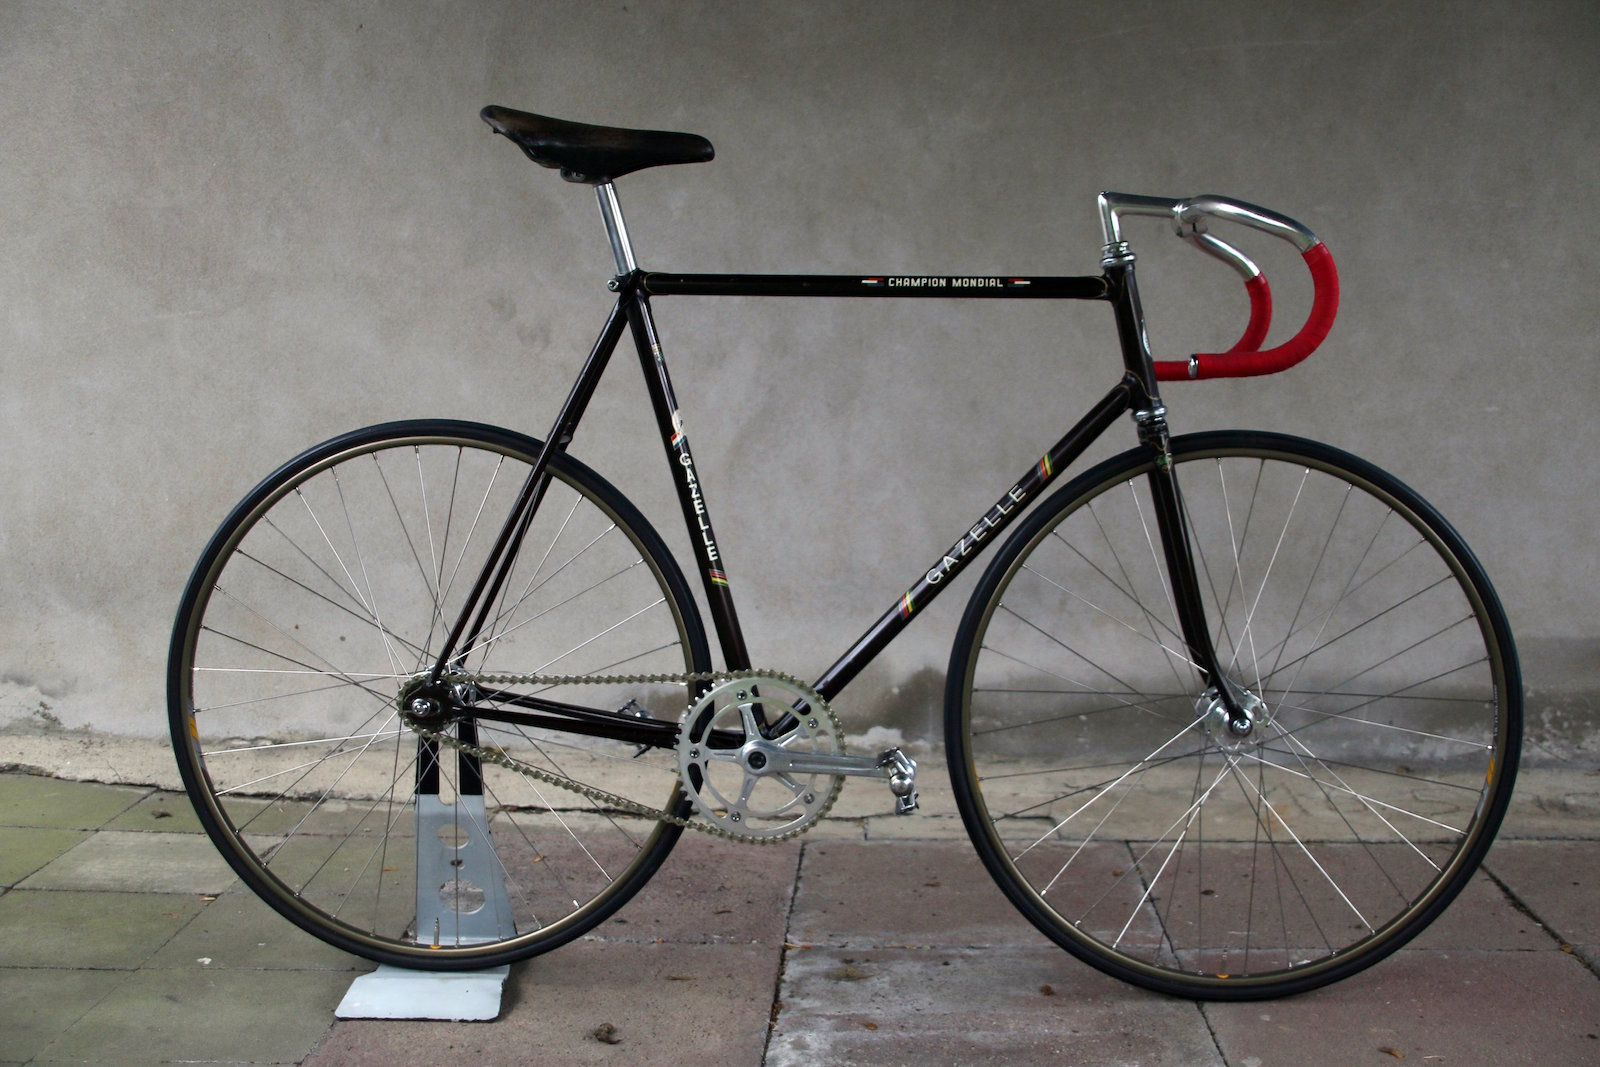 Gazelle Champion Mondial Bahnrad